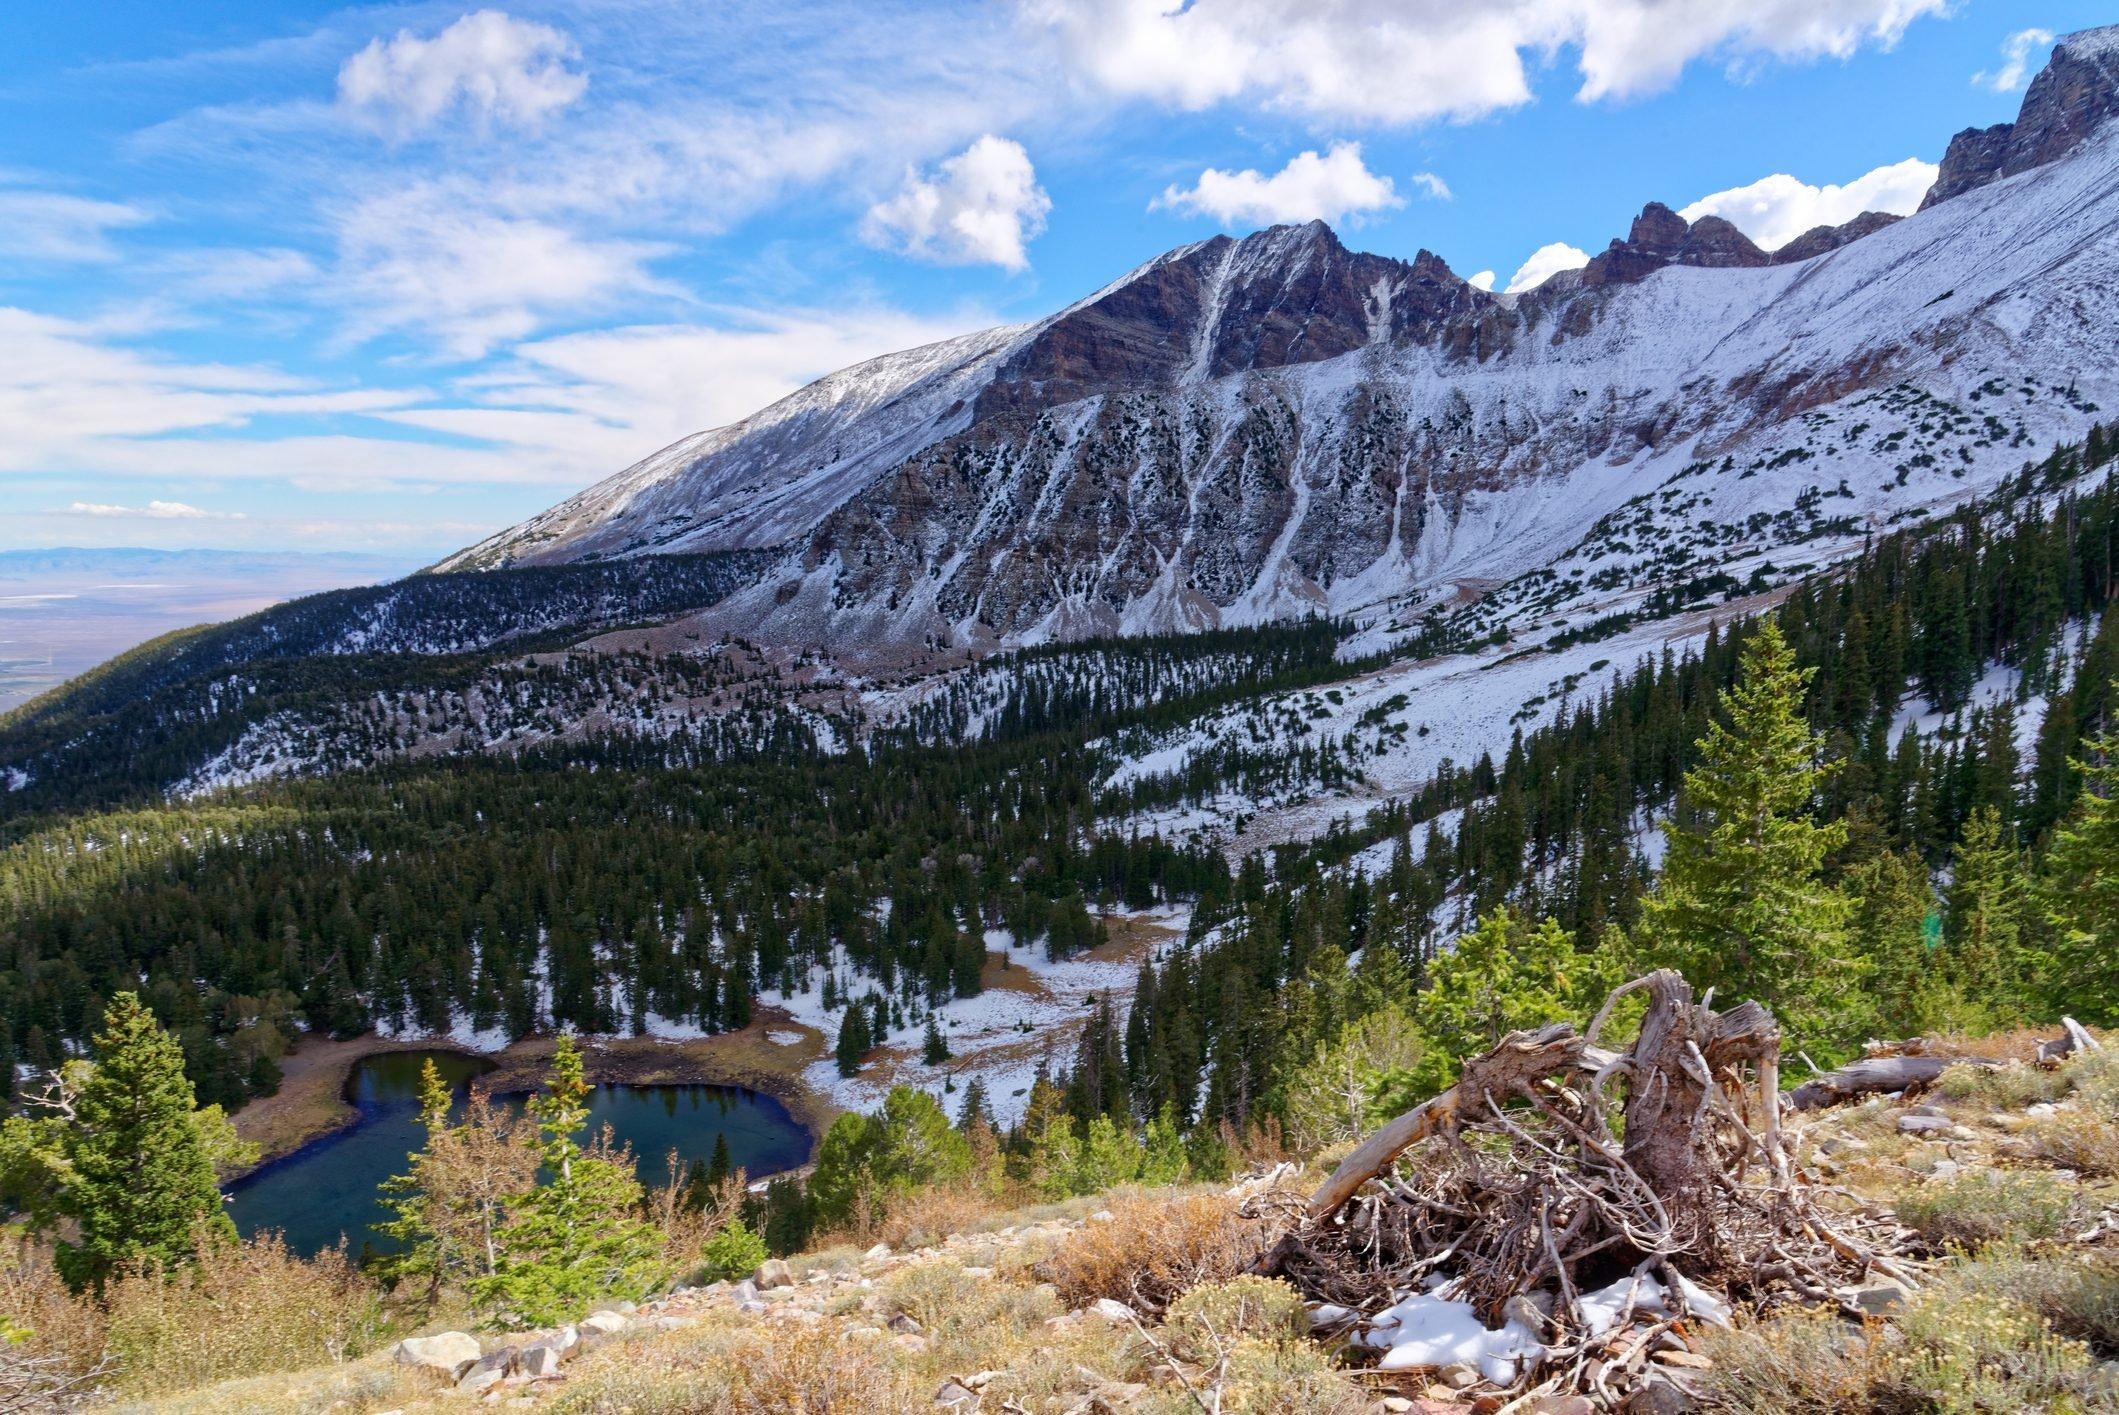 Wheeler Peak Trail, Great Basin National Park